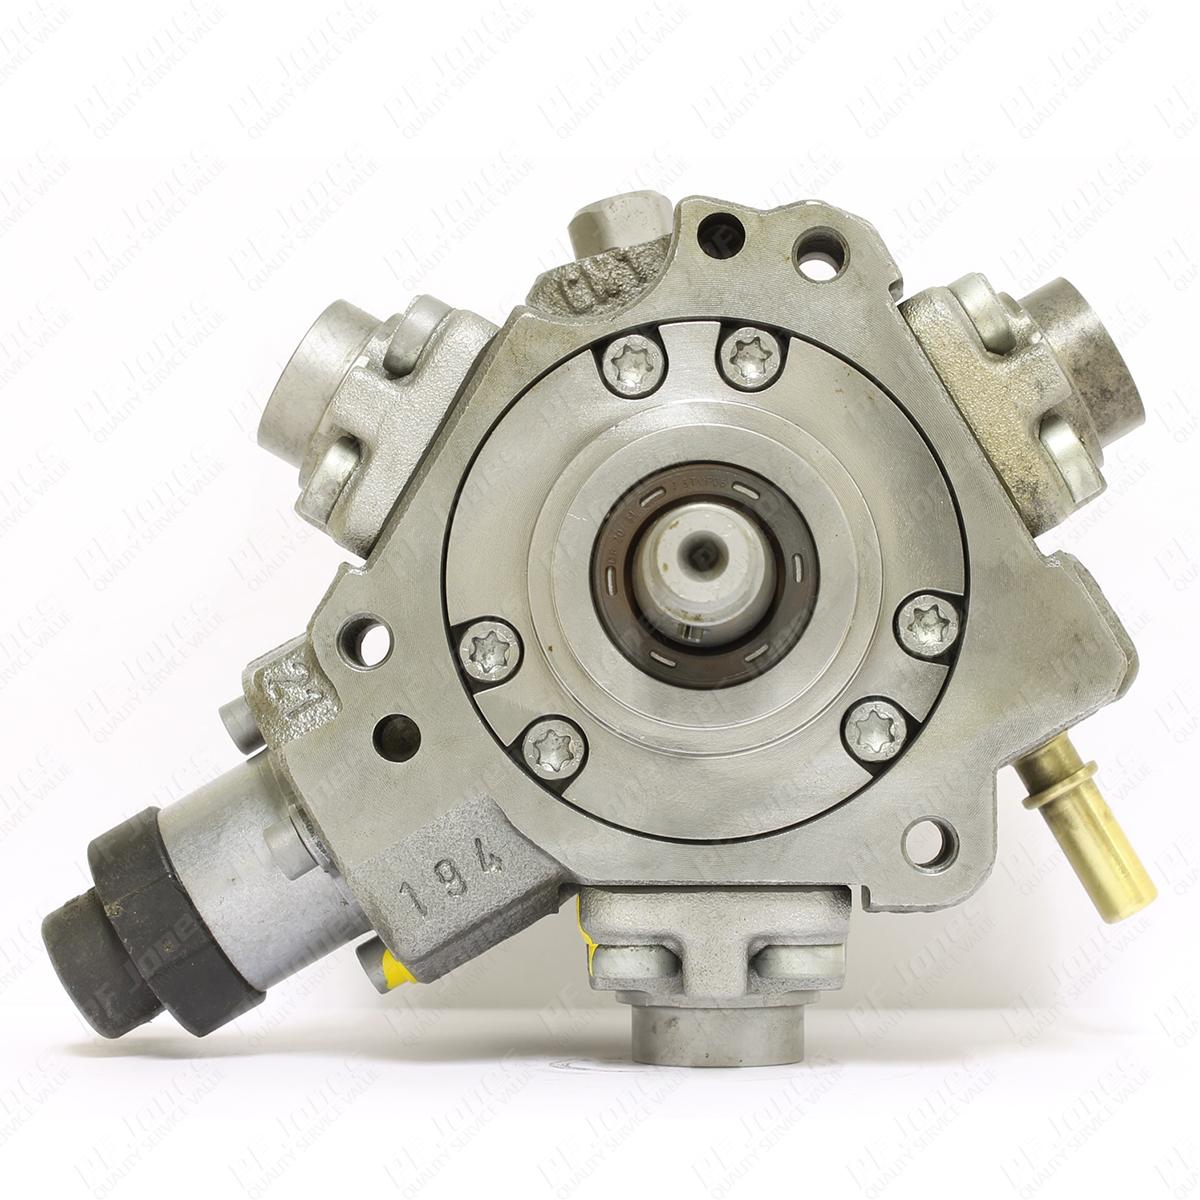 Peugeot 3008 1.6 HDI 2009 Onwards New Bosch Diesel Fuel Pump 0445010296